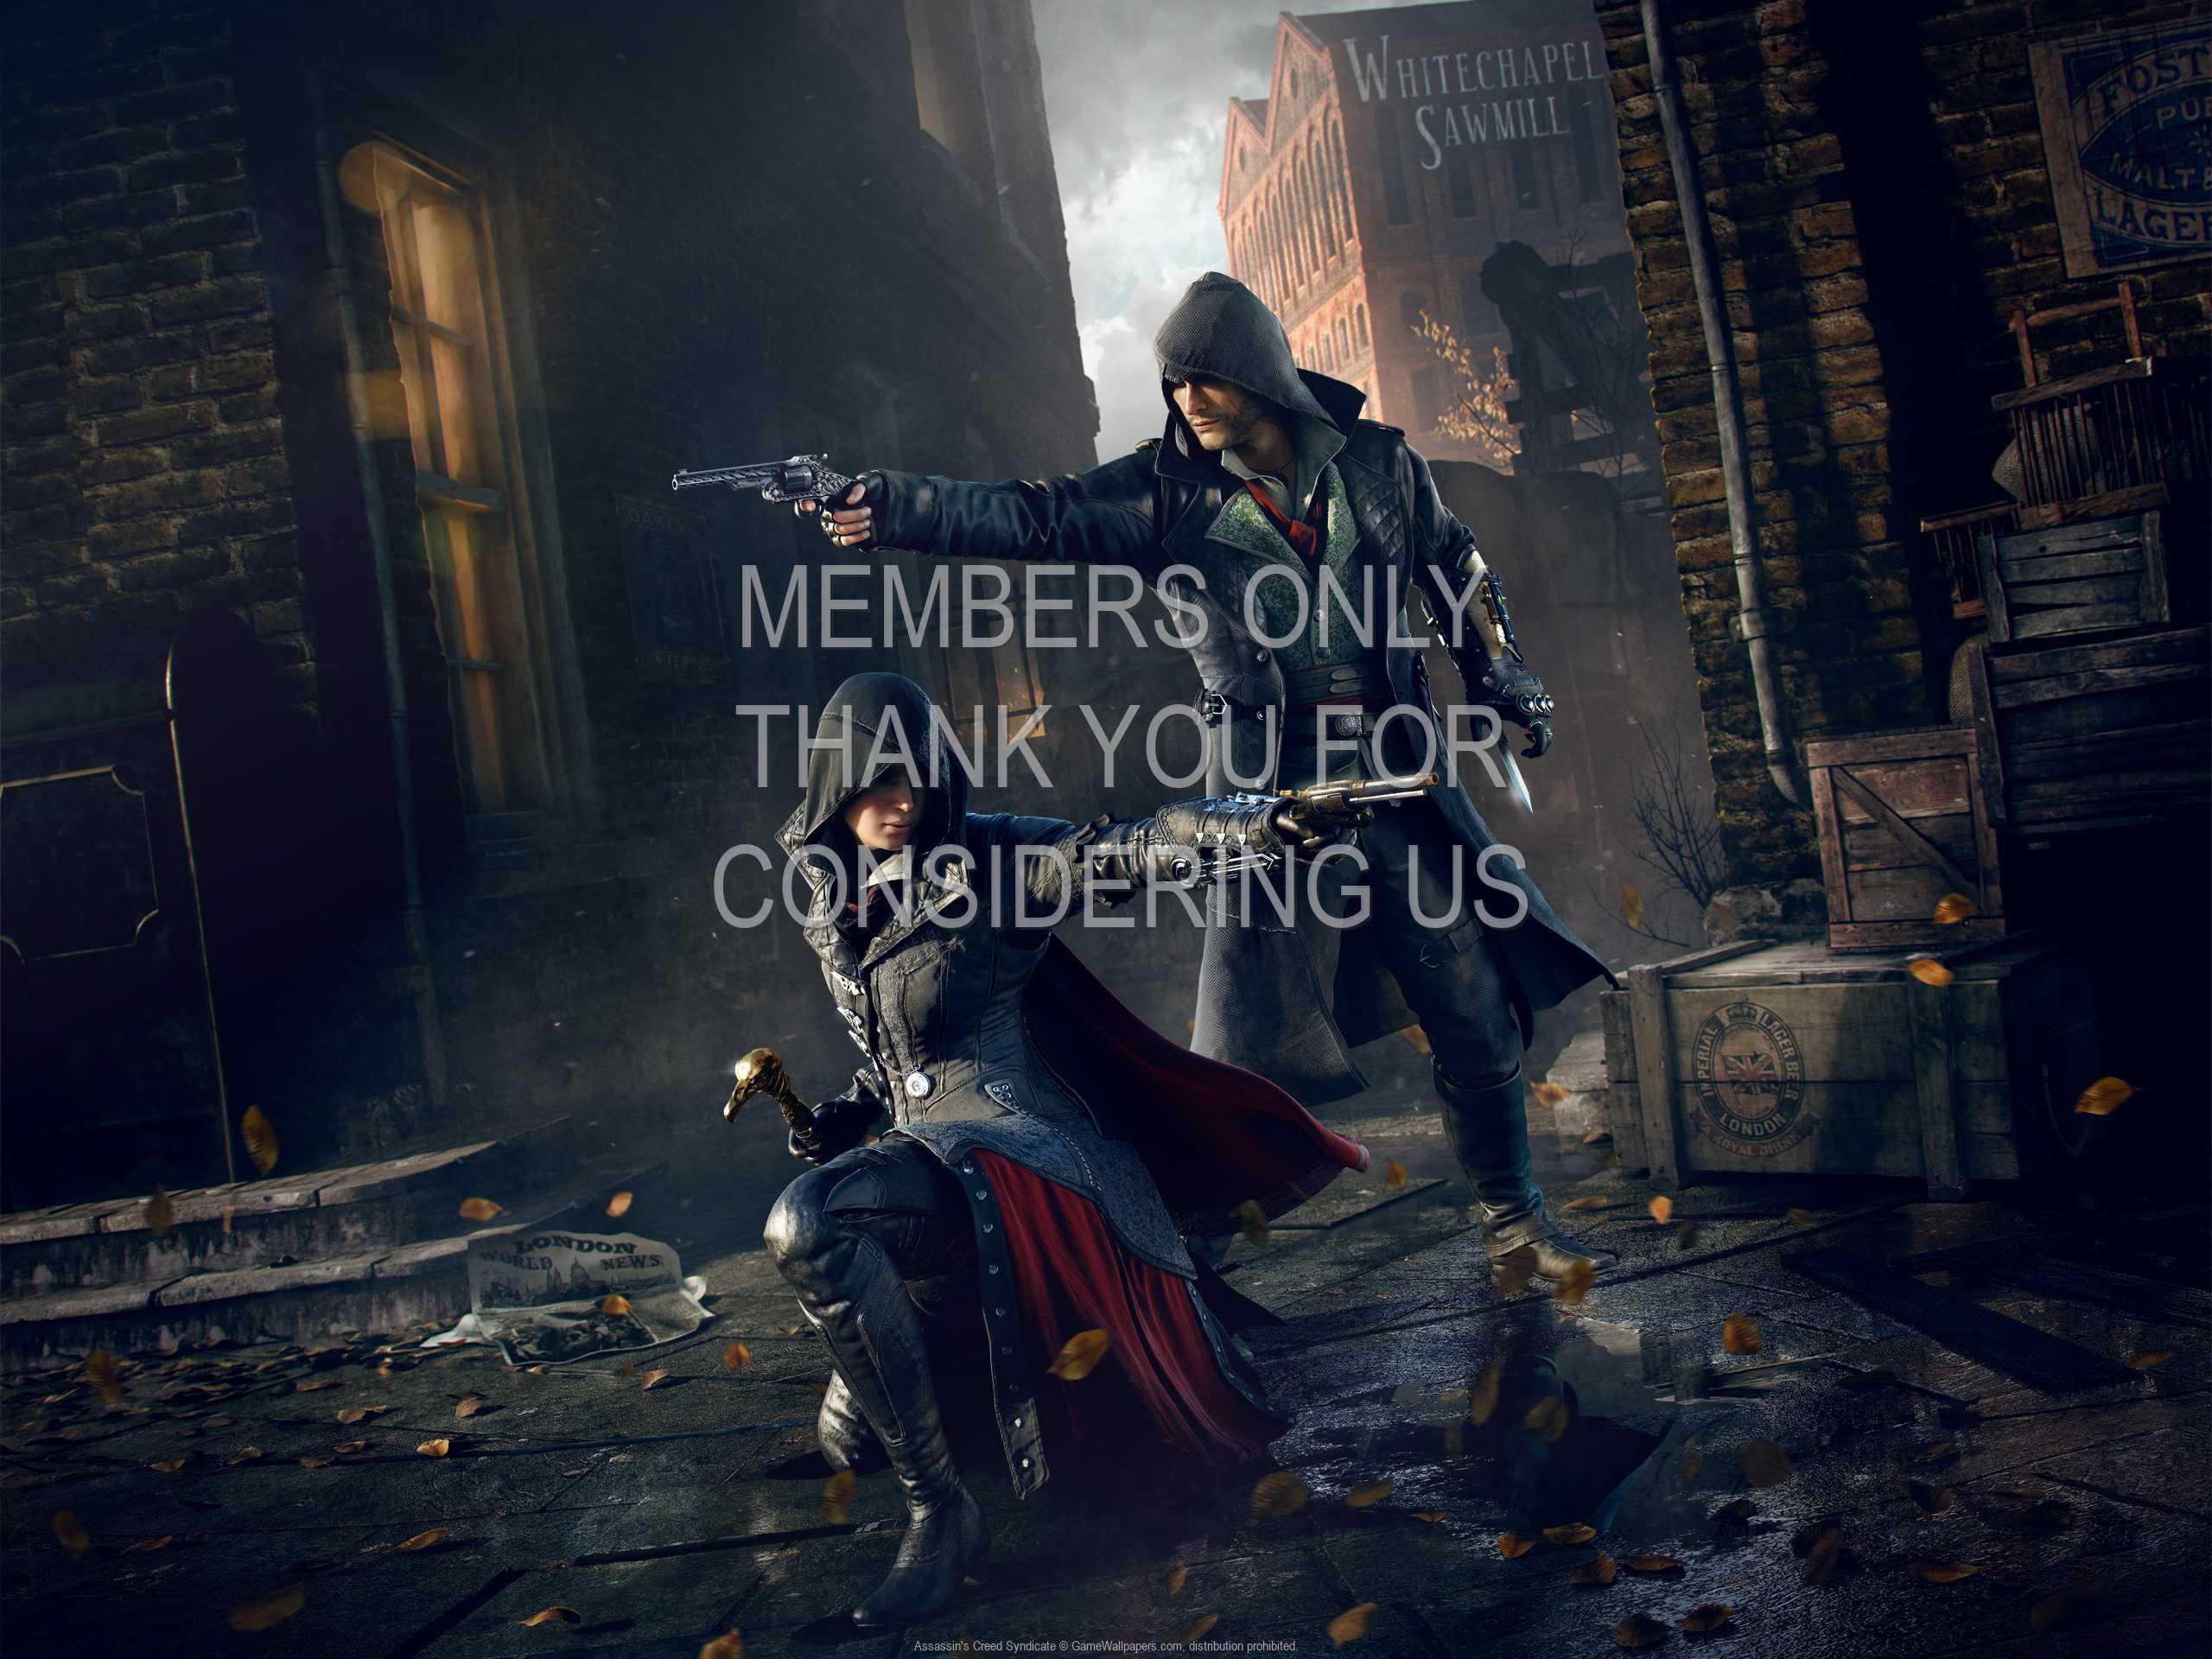 Assassin's Creed: Syndicate 1080p Horizontal Handy Hintergrundbild 14